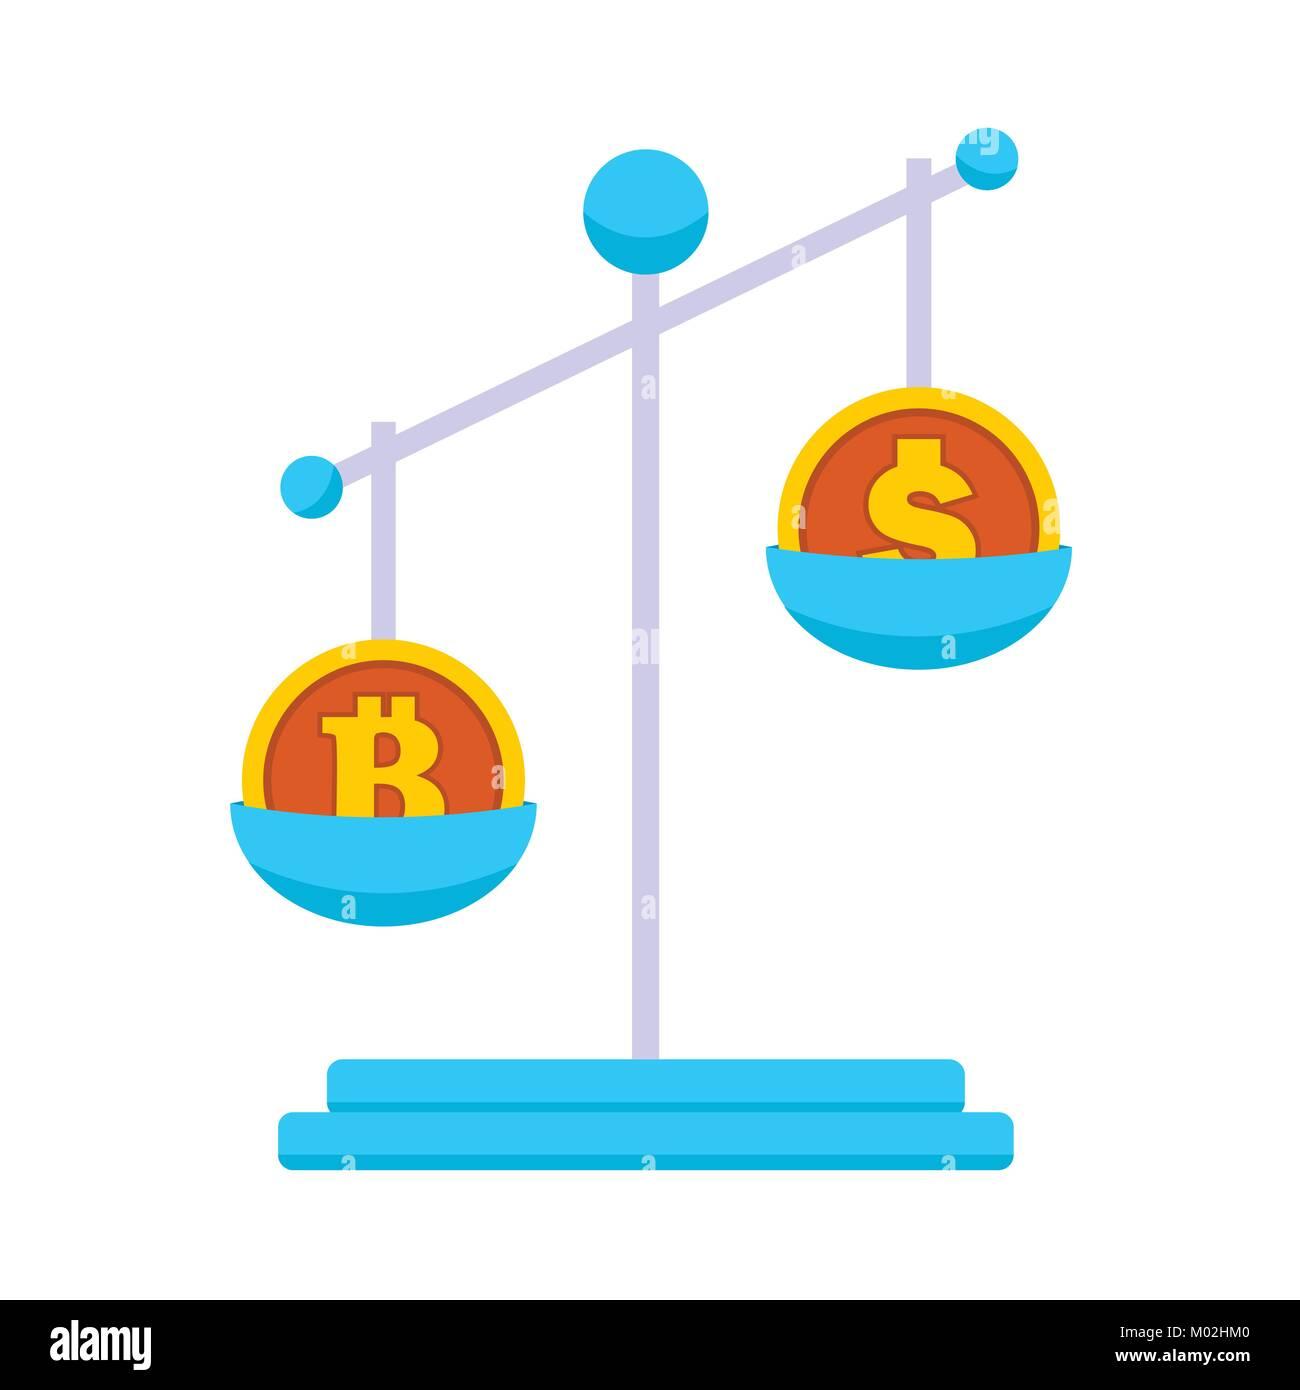 Bitcoin Markey Scale Value Vector Illustration Graphic - Stock Image